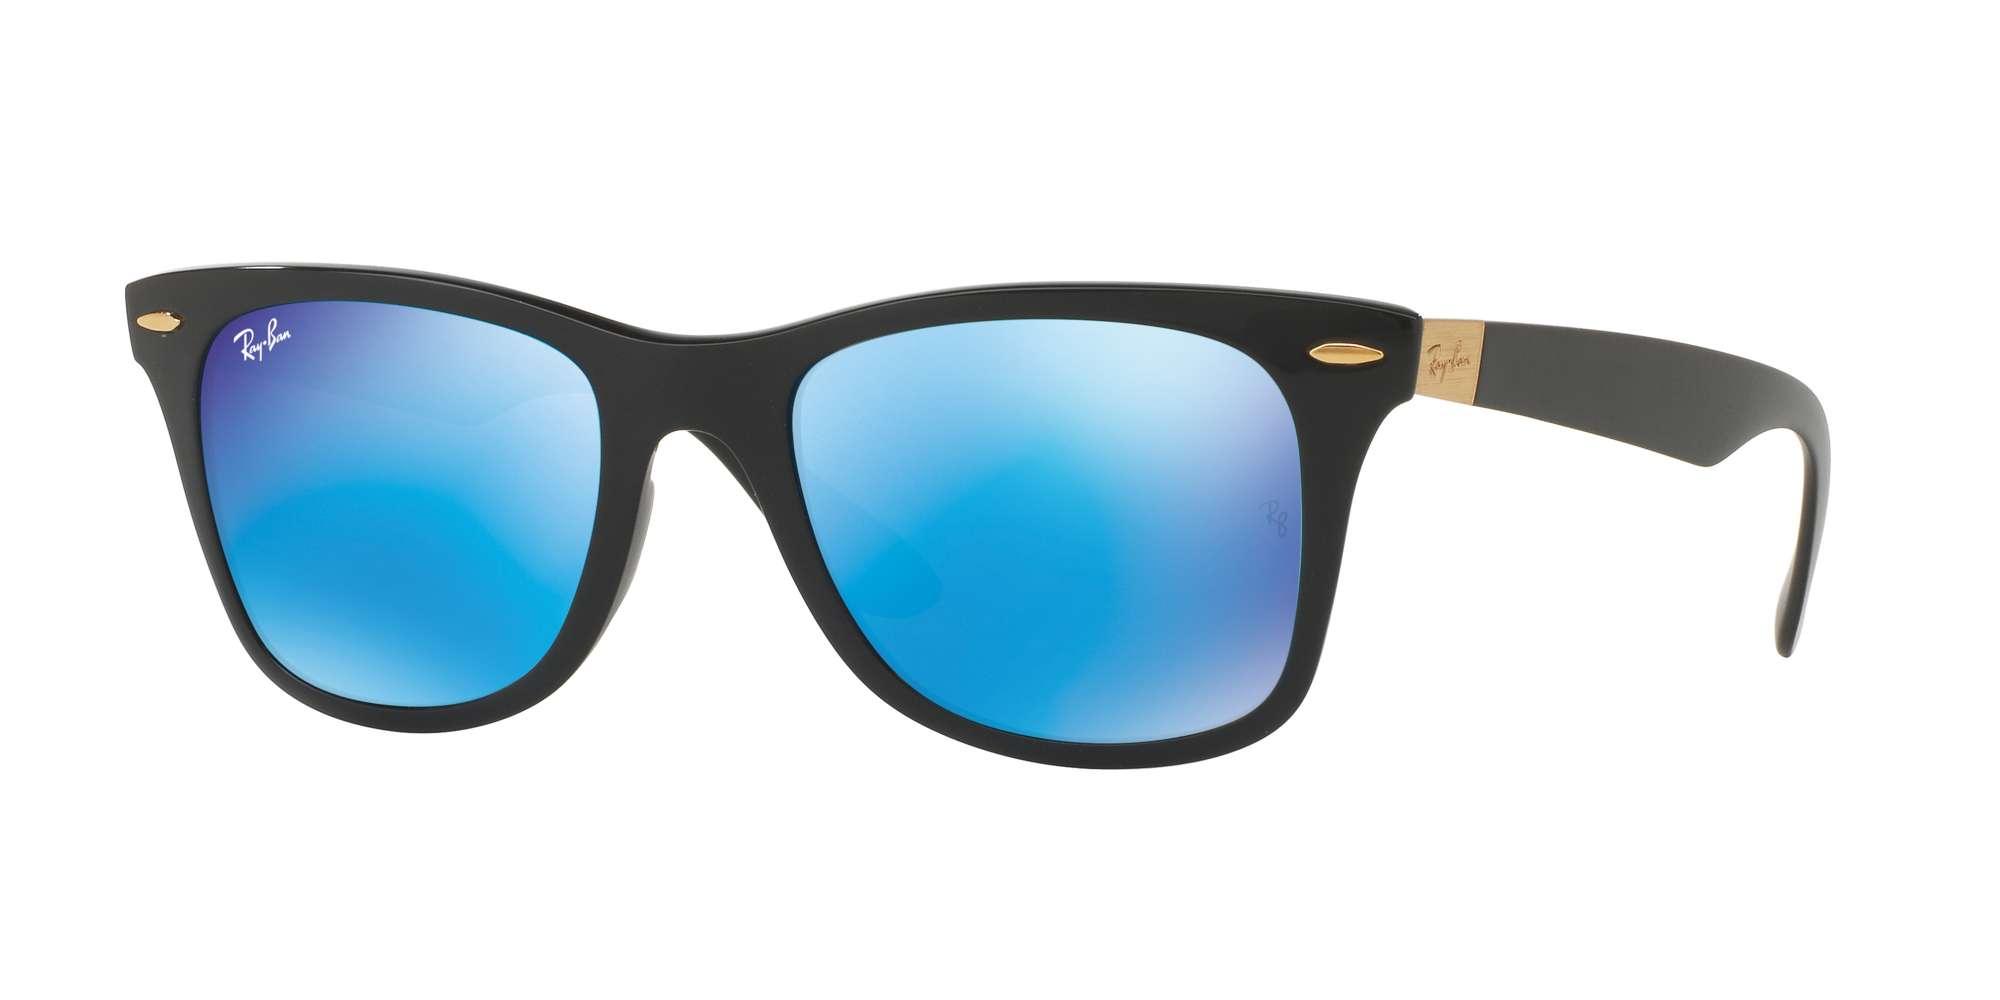 MATTE BLACK / BLUE FLASH lenses